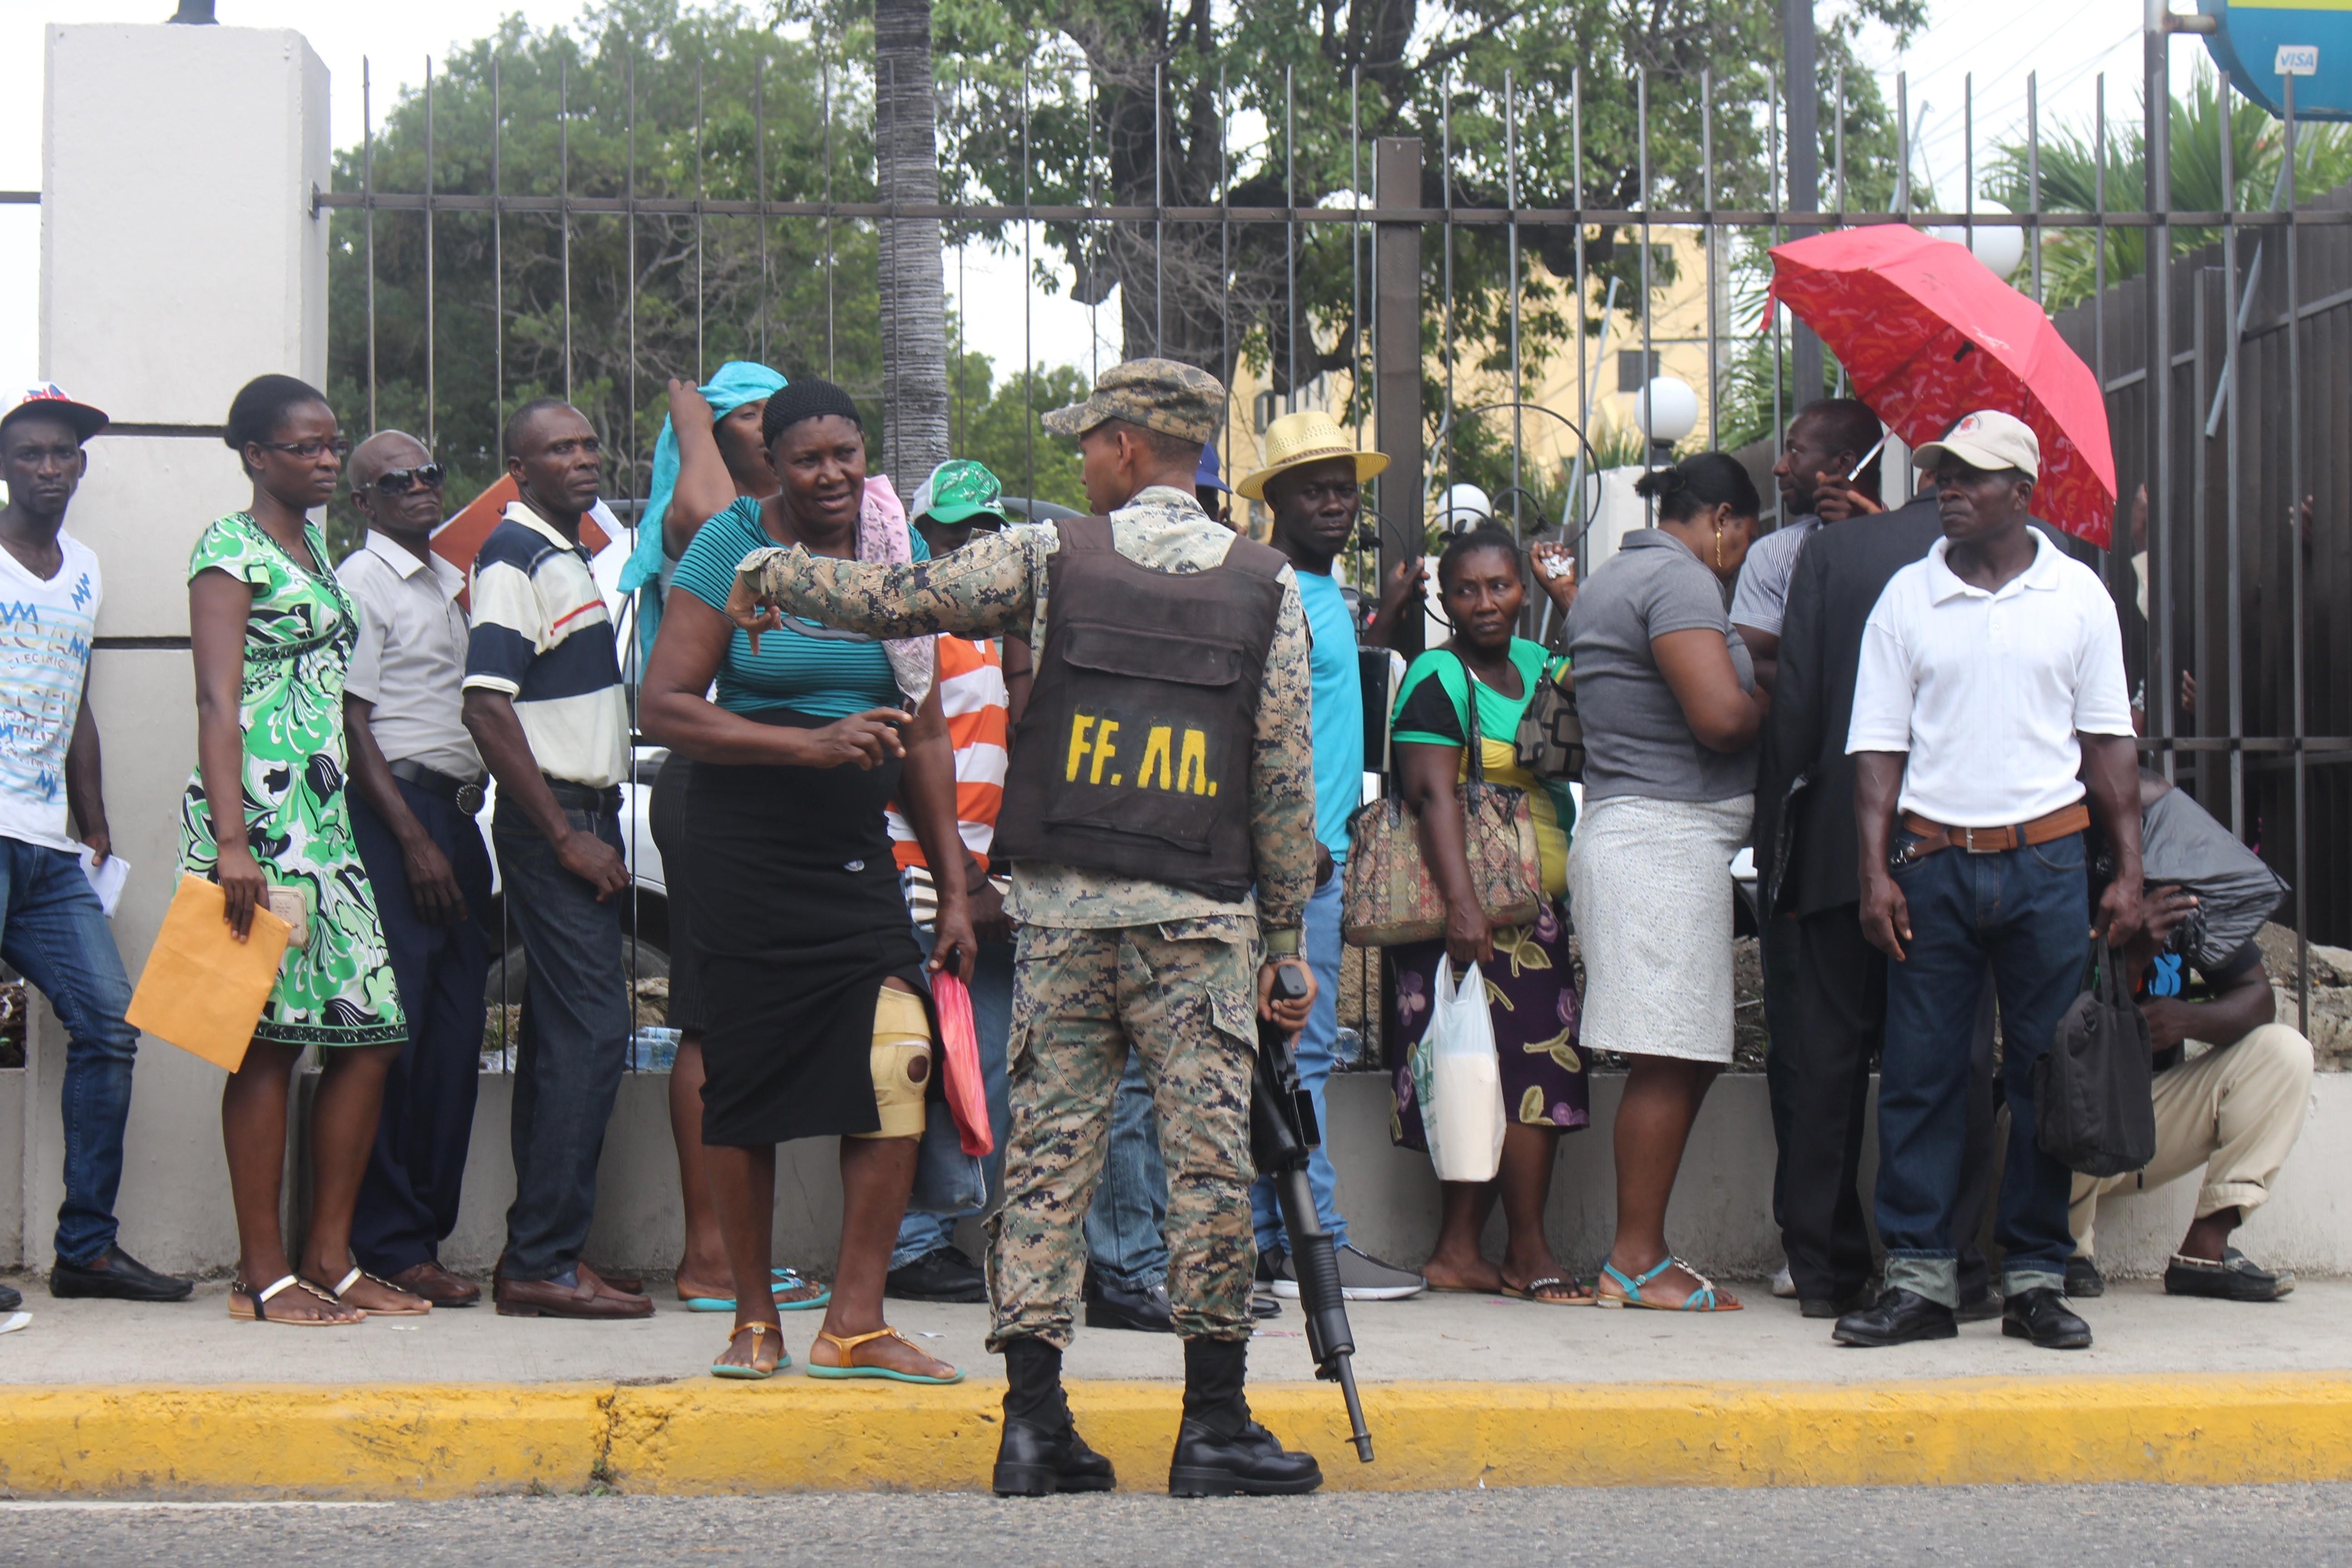 haitian migrants expulsion from republic